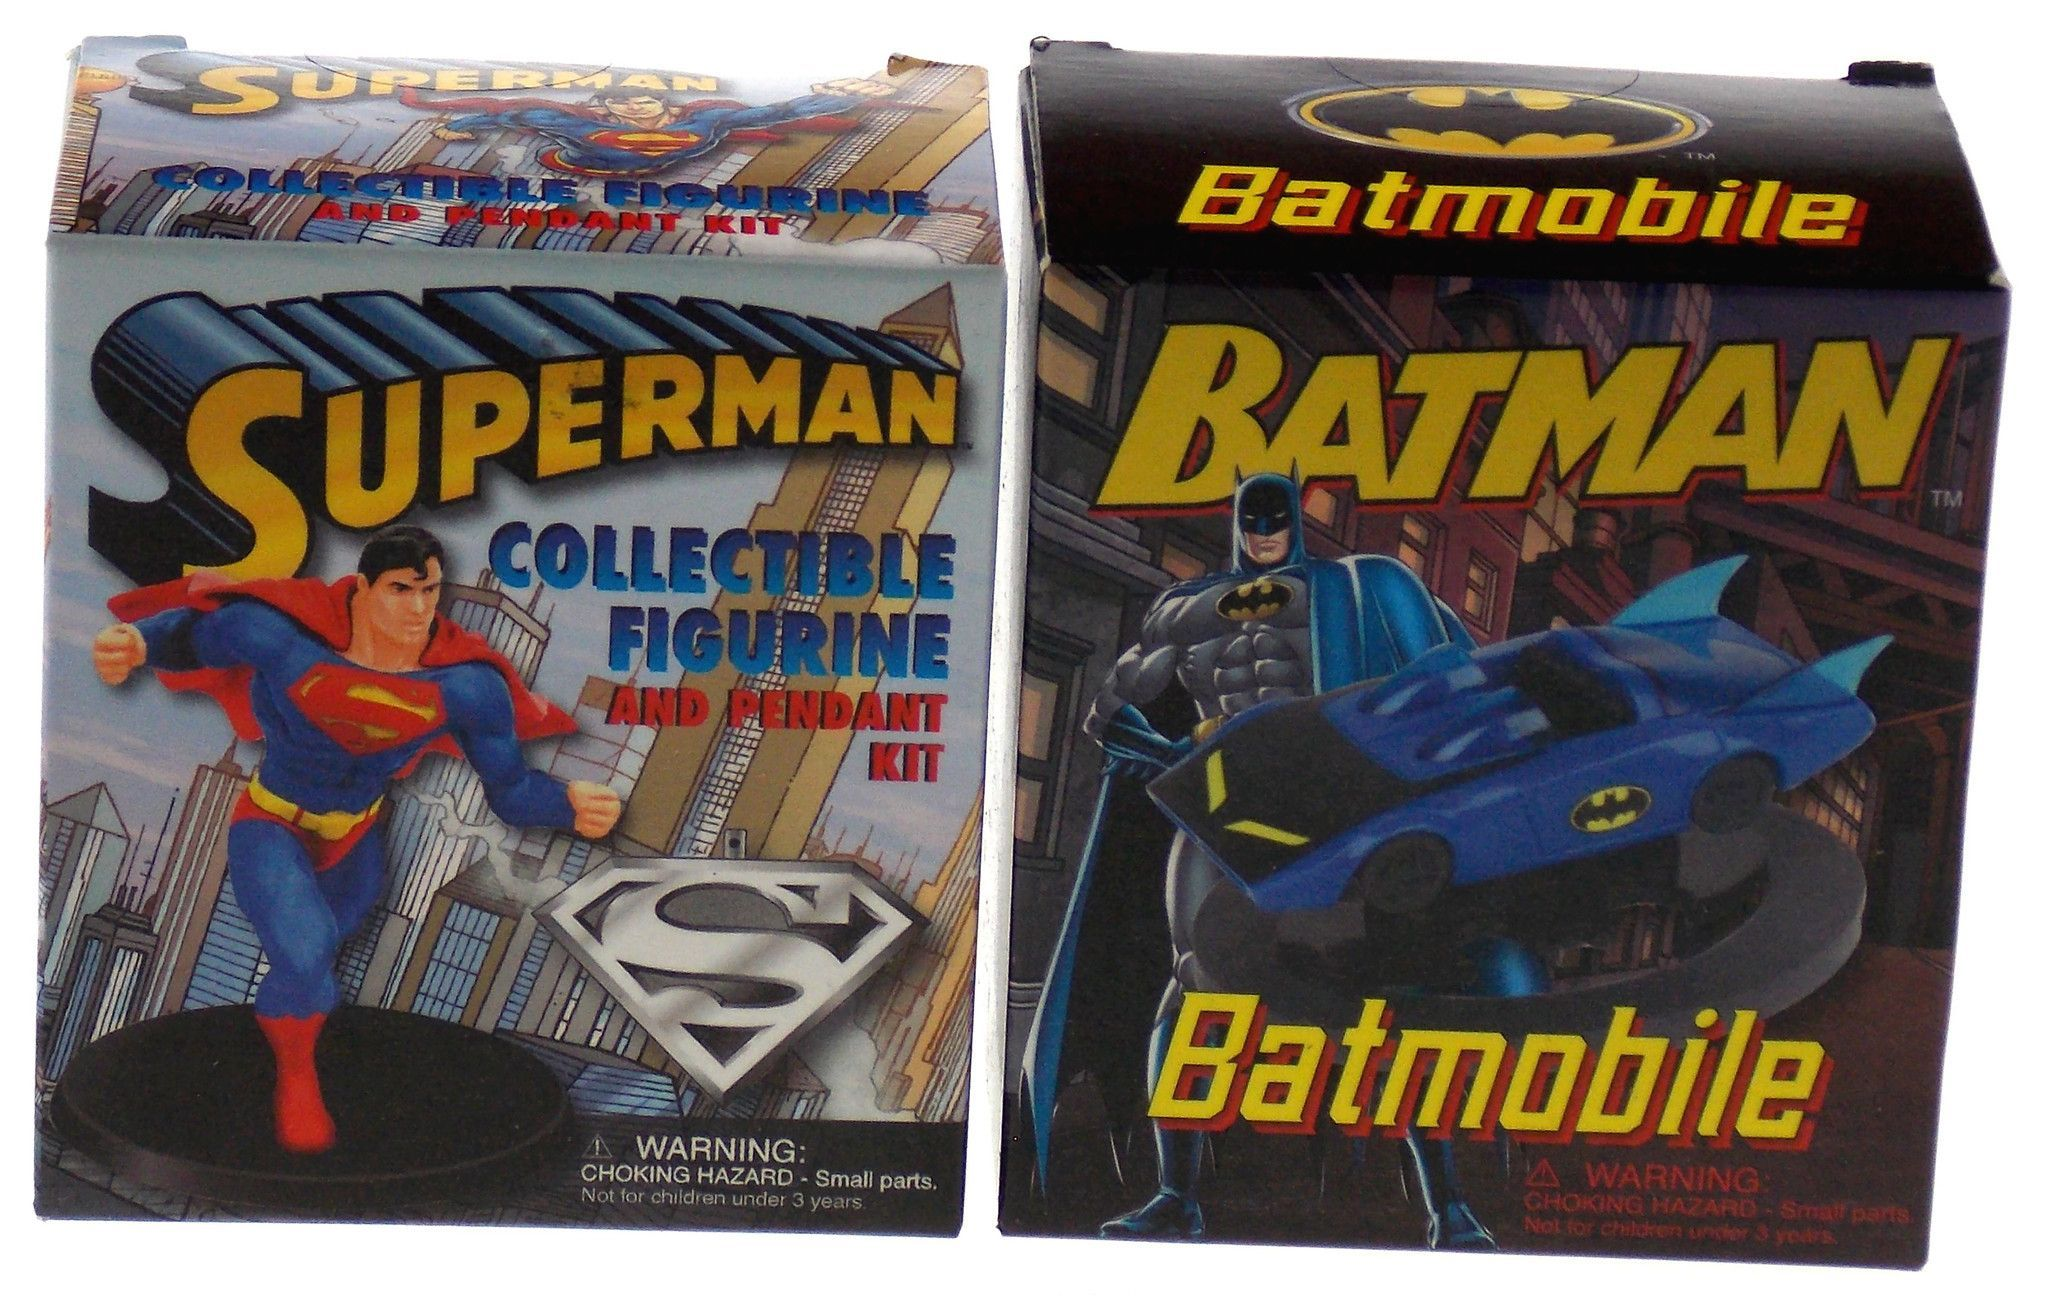 Set of 2 Batman v Superman Collectible Figurine Pendant Batmobile Mega Mini Kits